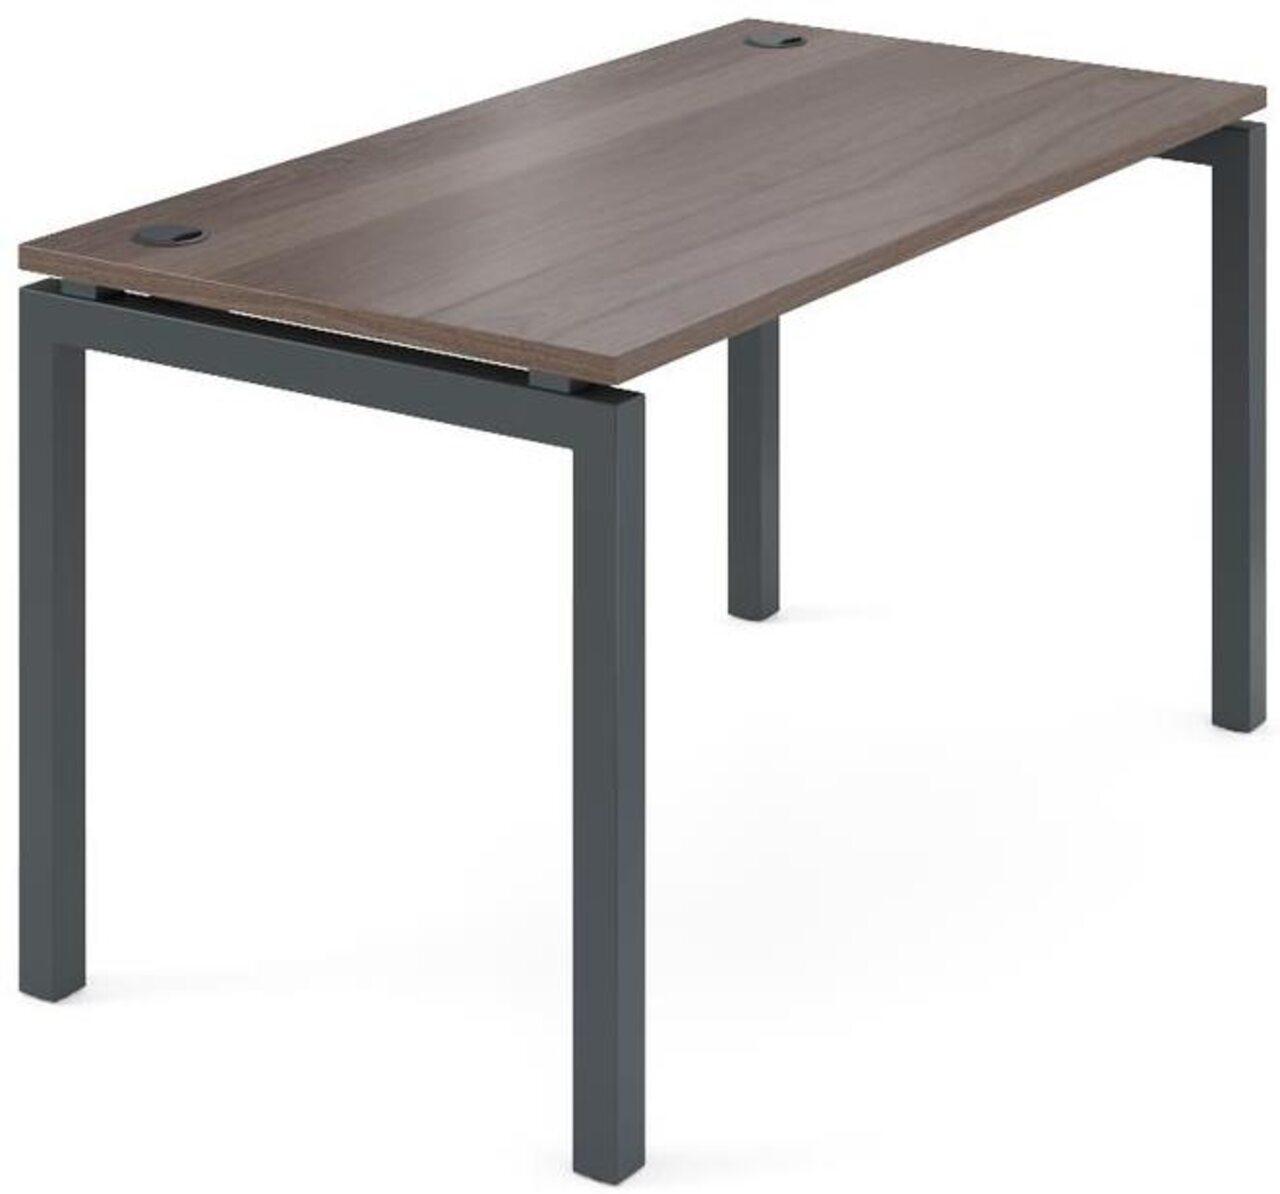 Стол на металлокаркасе  Арго 140x73x76 - фото 8